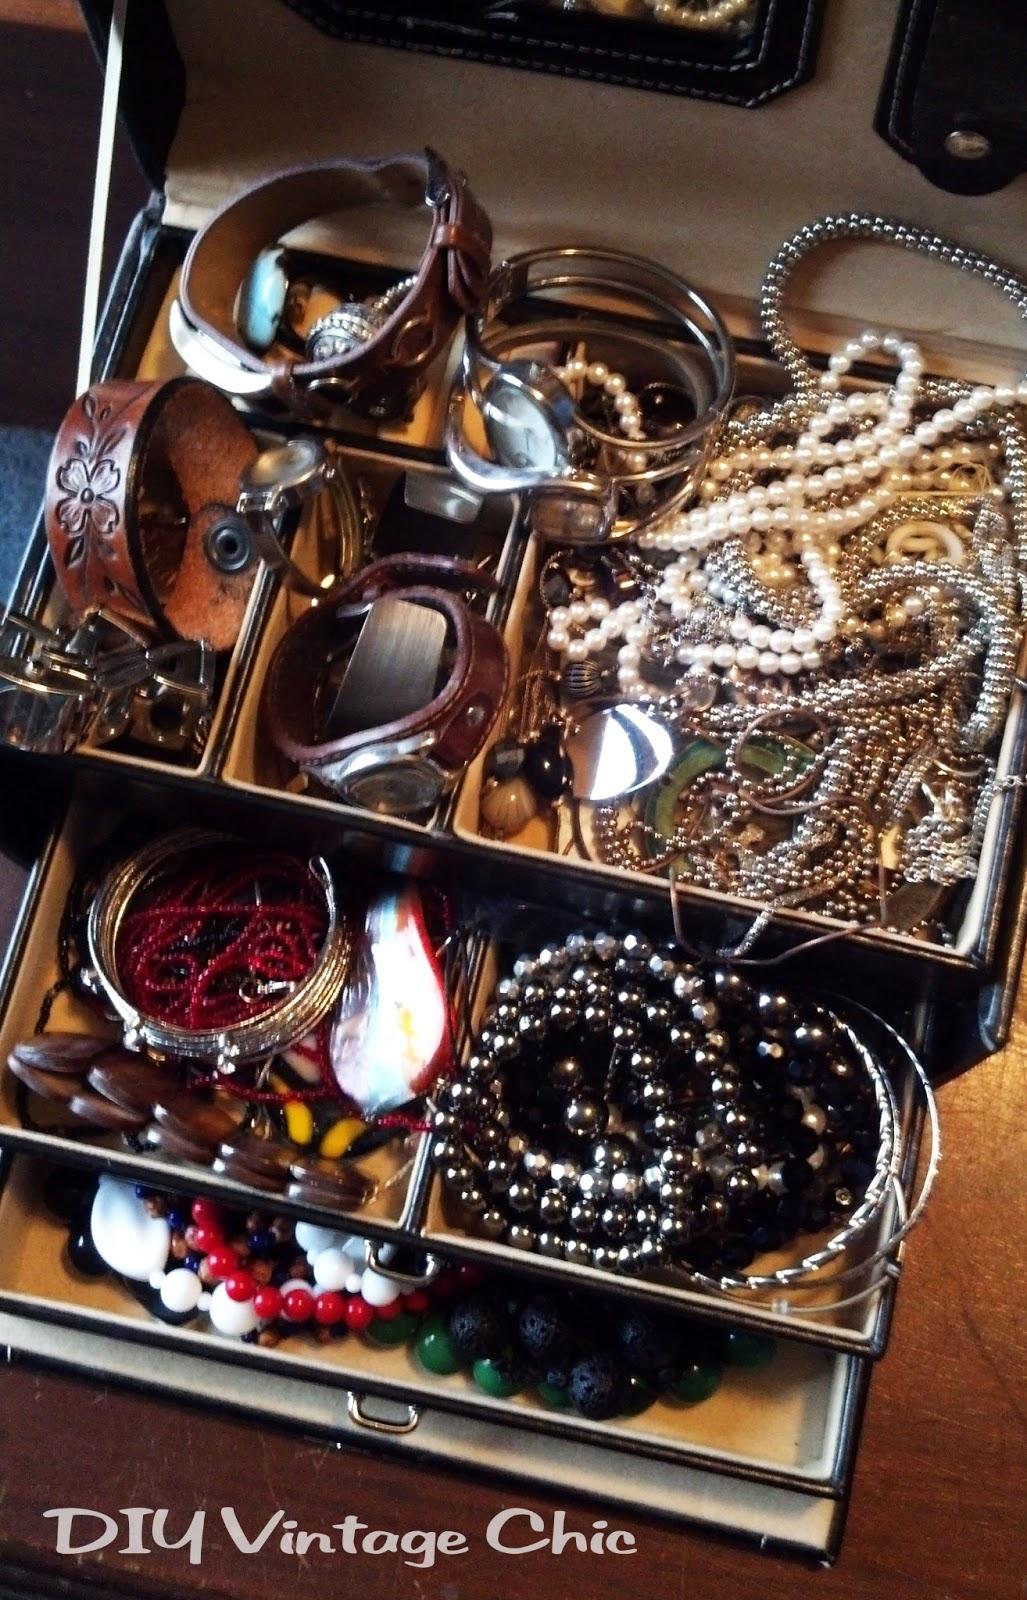 DIY Vintage Chic DIY Jewelry Holder